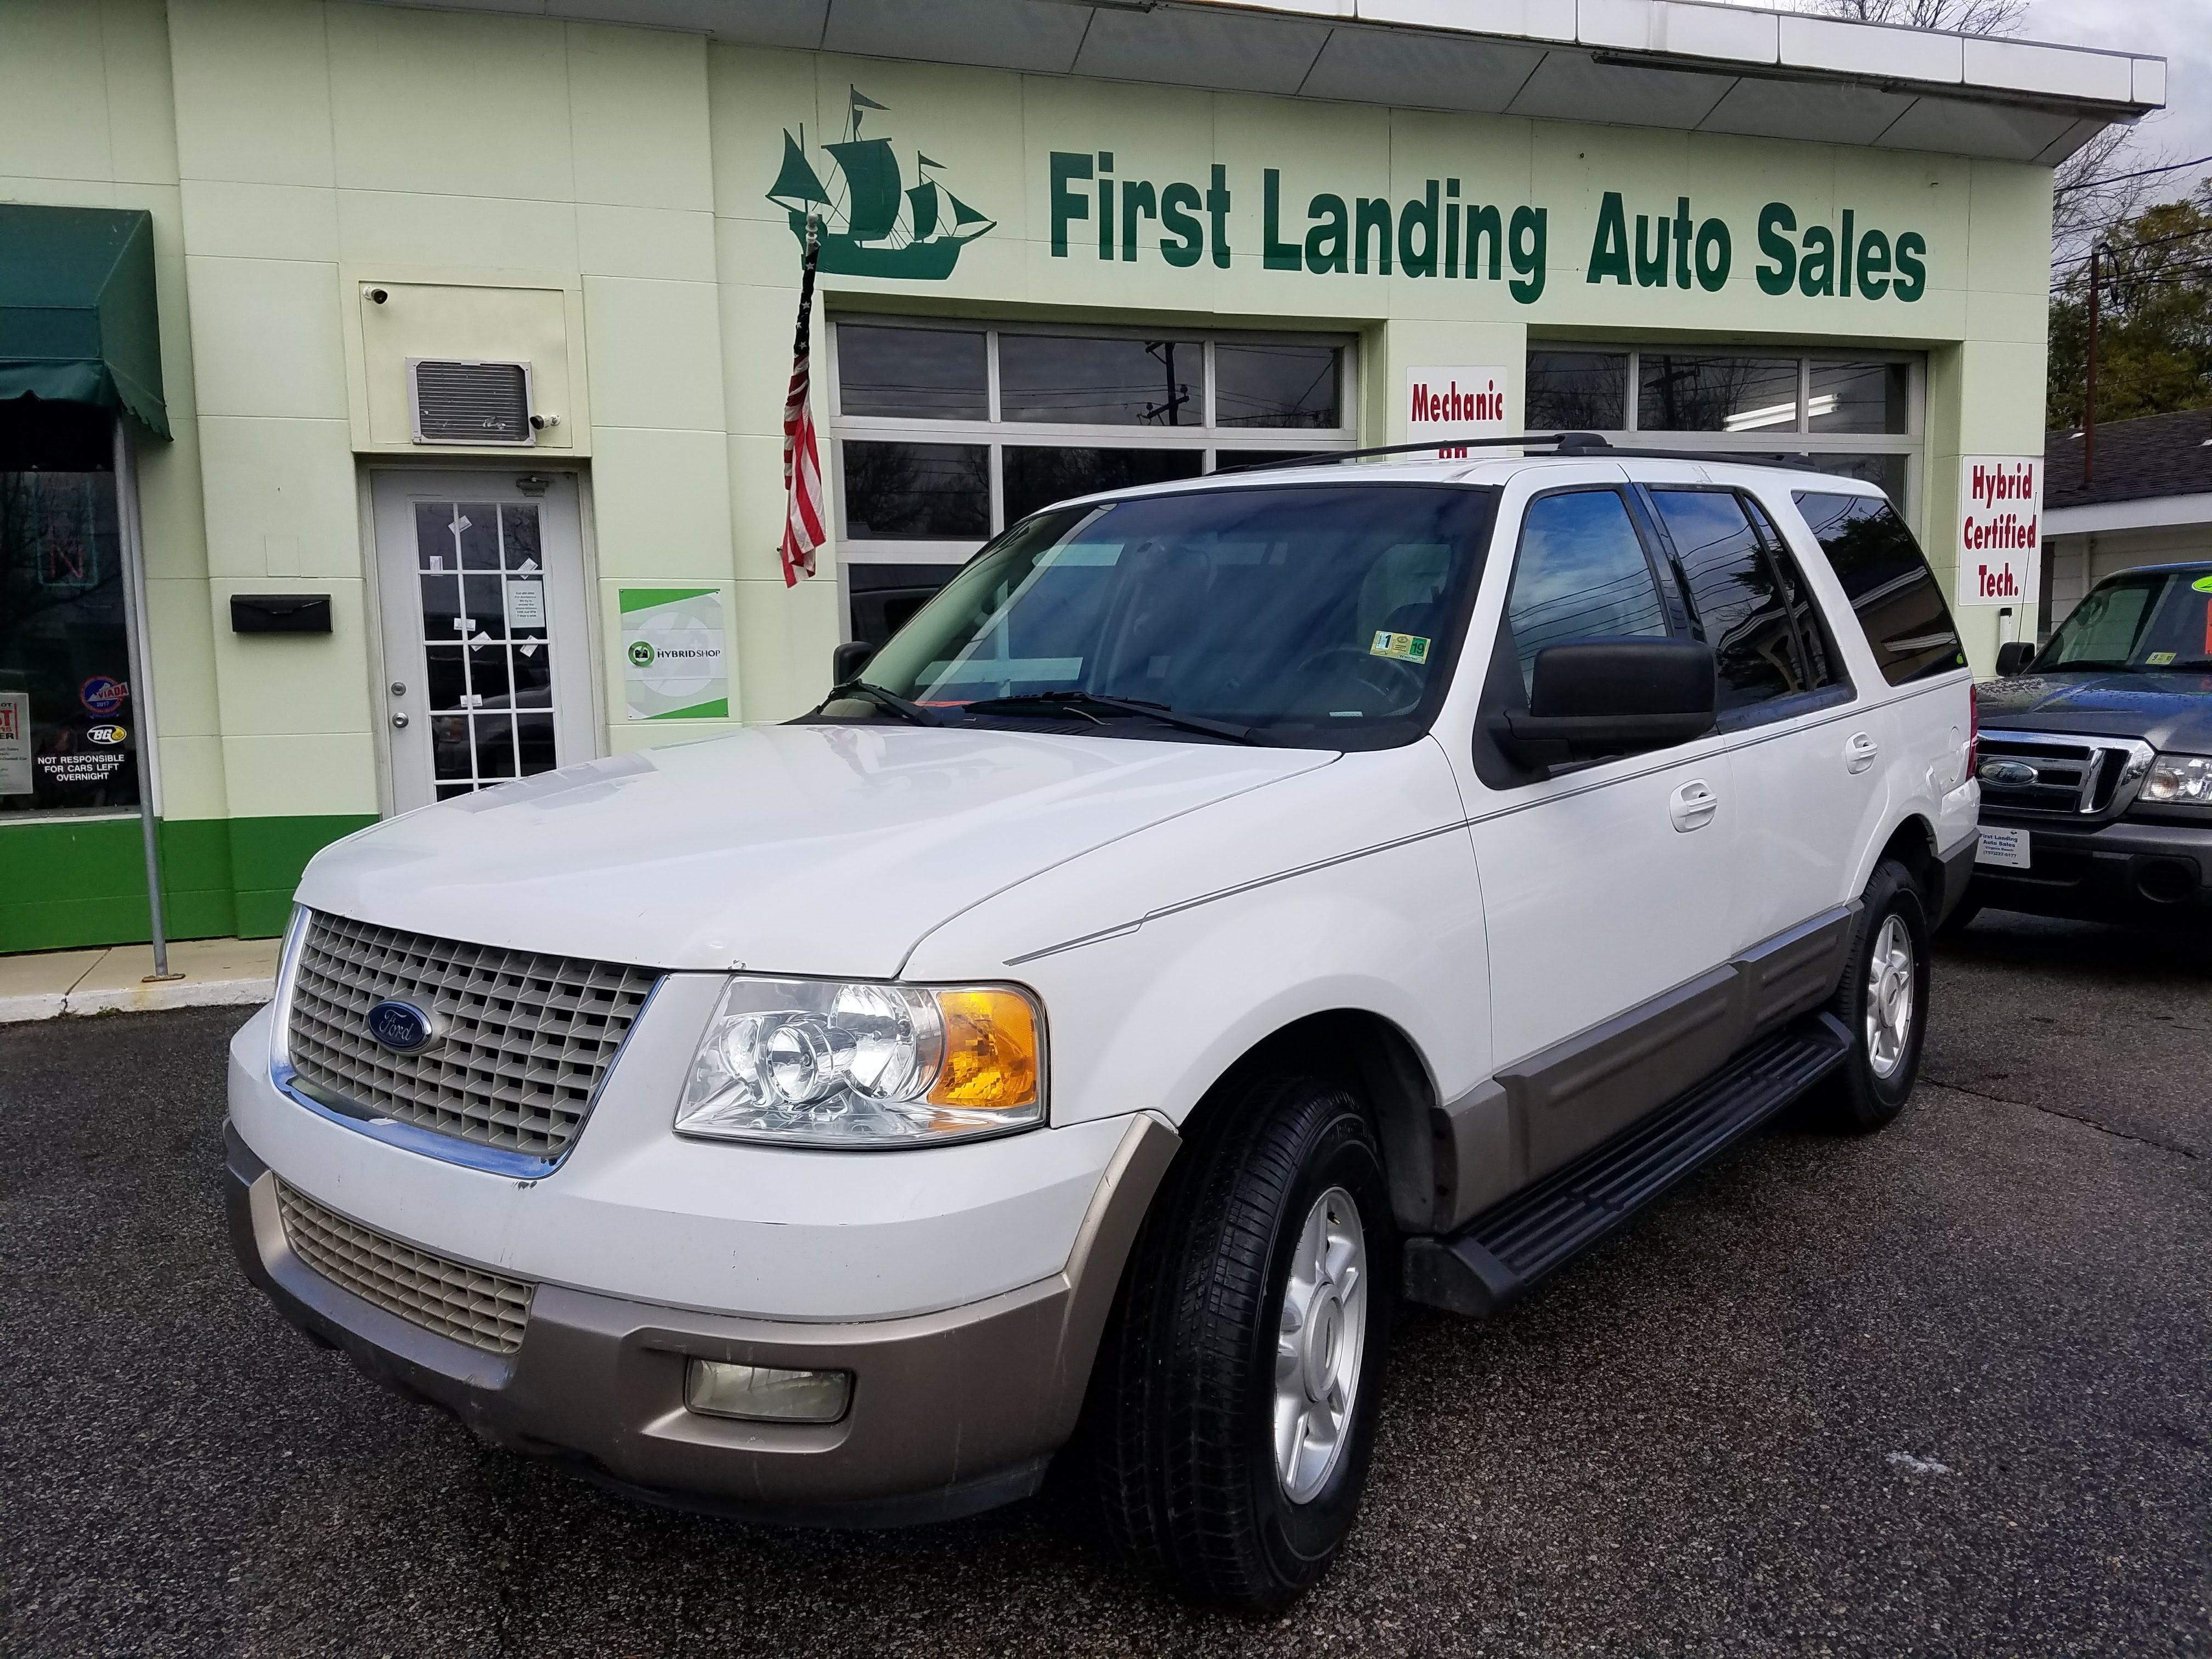 17 0098 1 First Landing Auto Sales